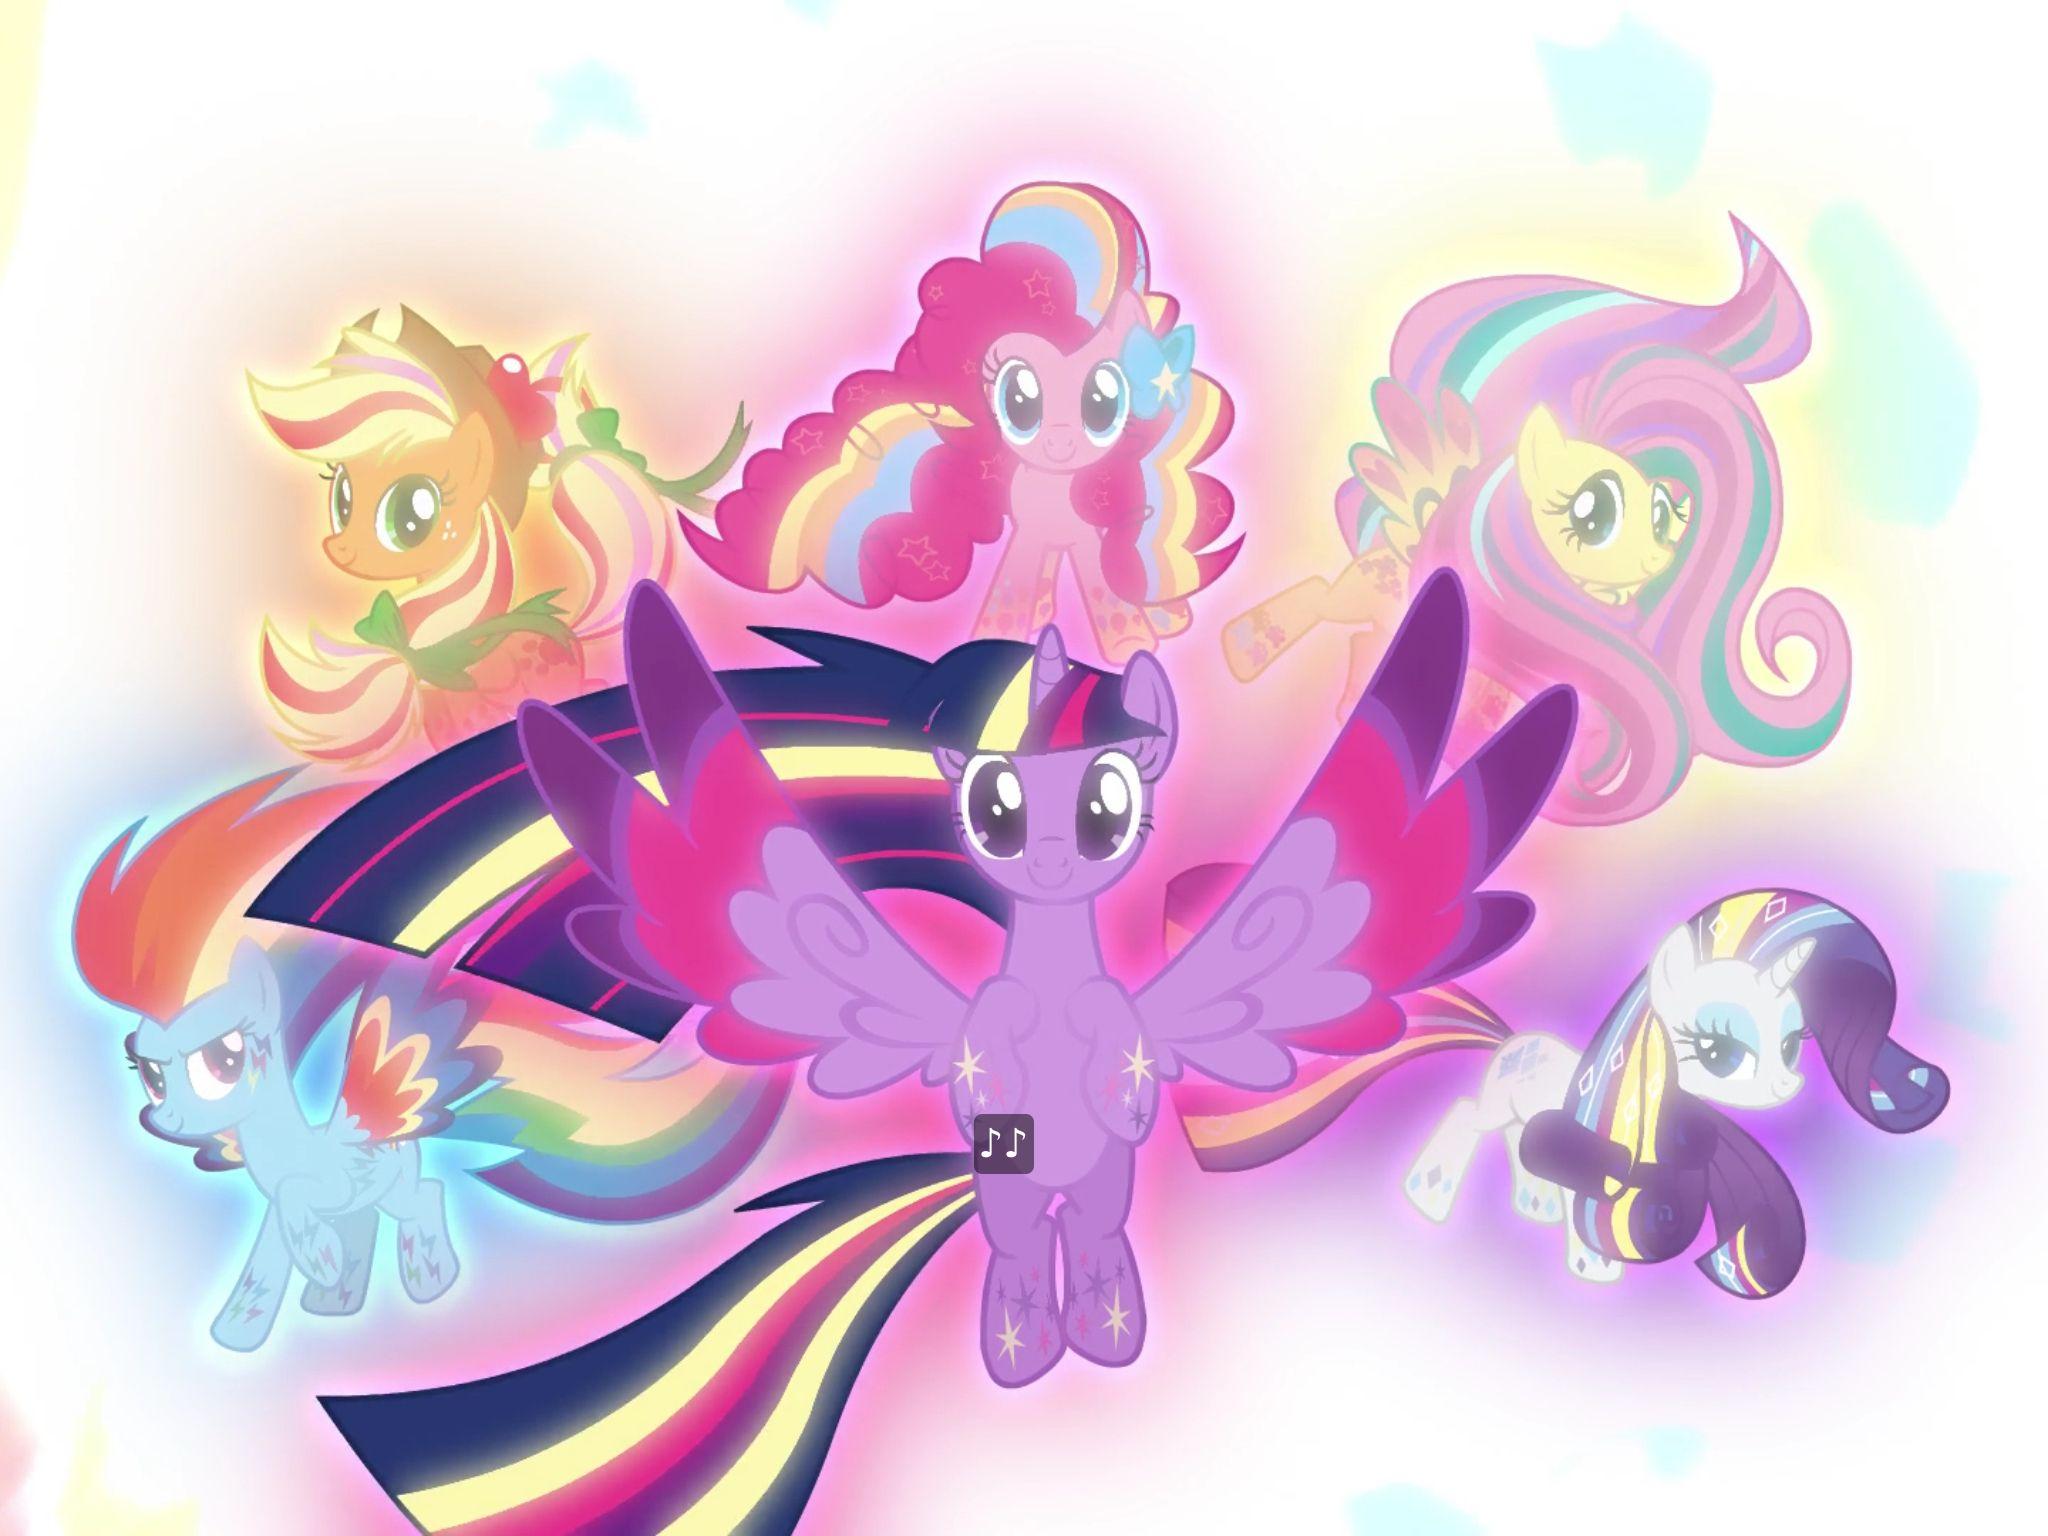 Rainbow Anime, Character, Hedgehog